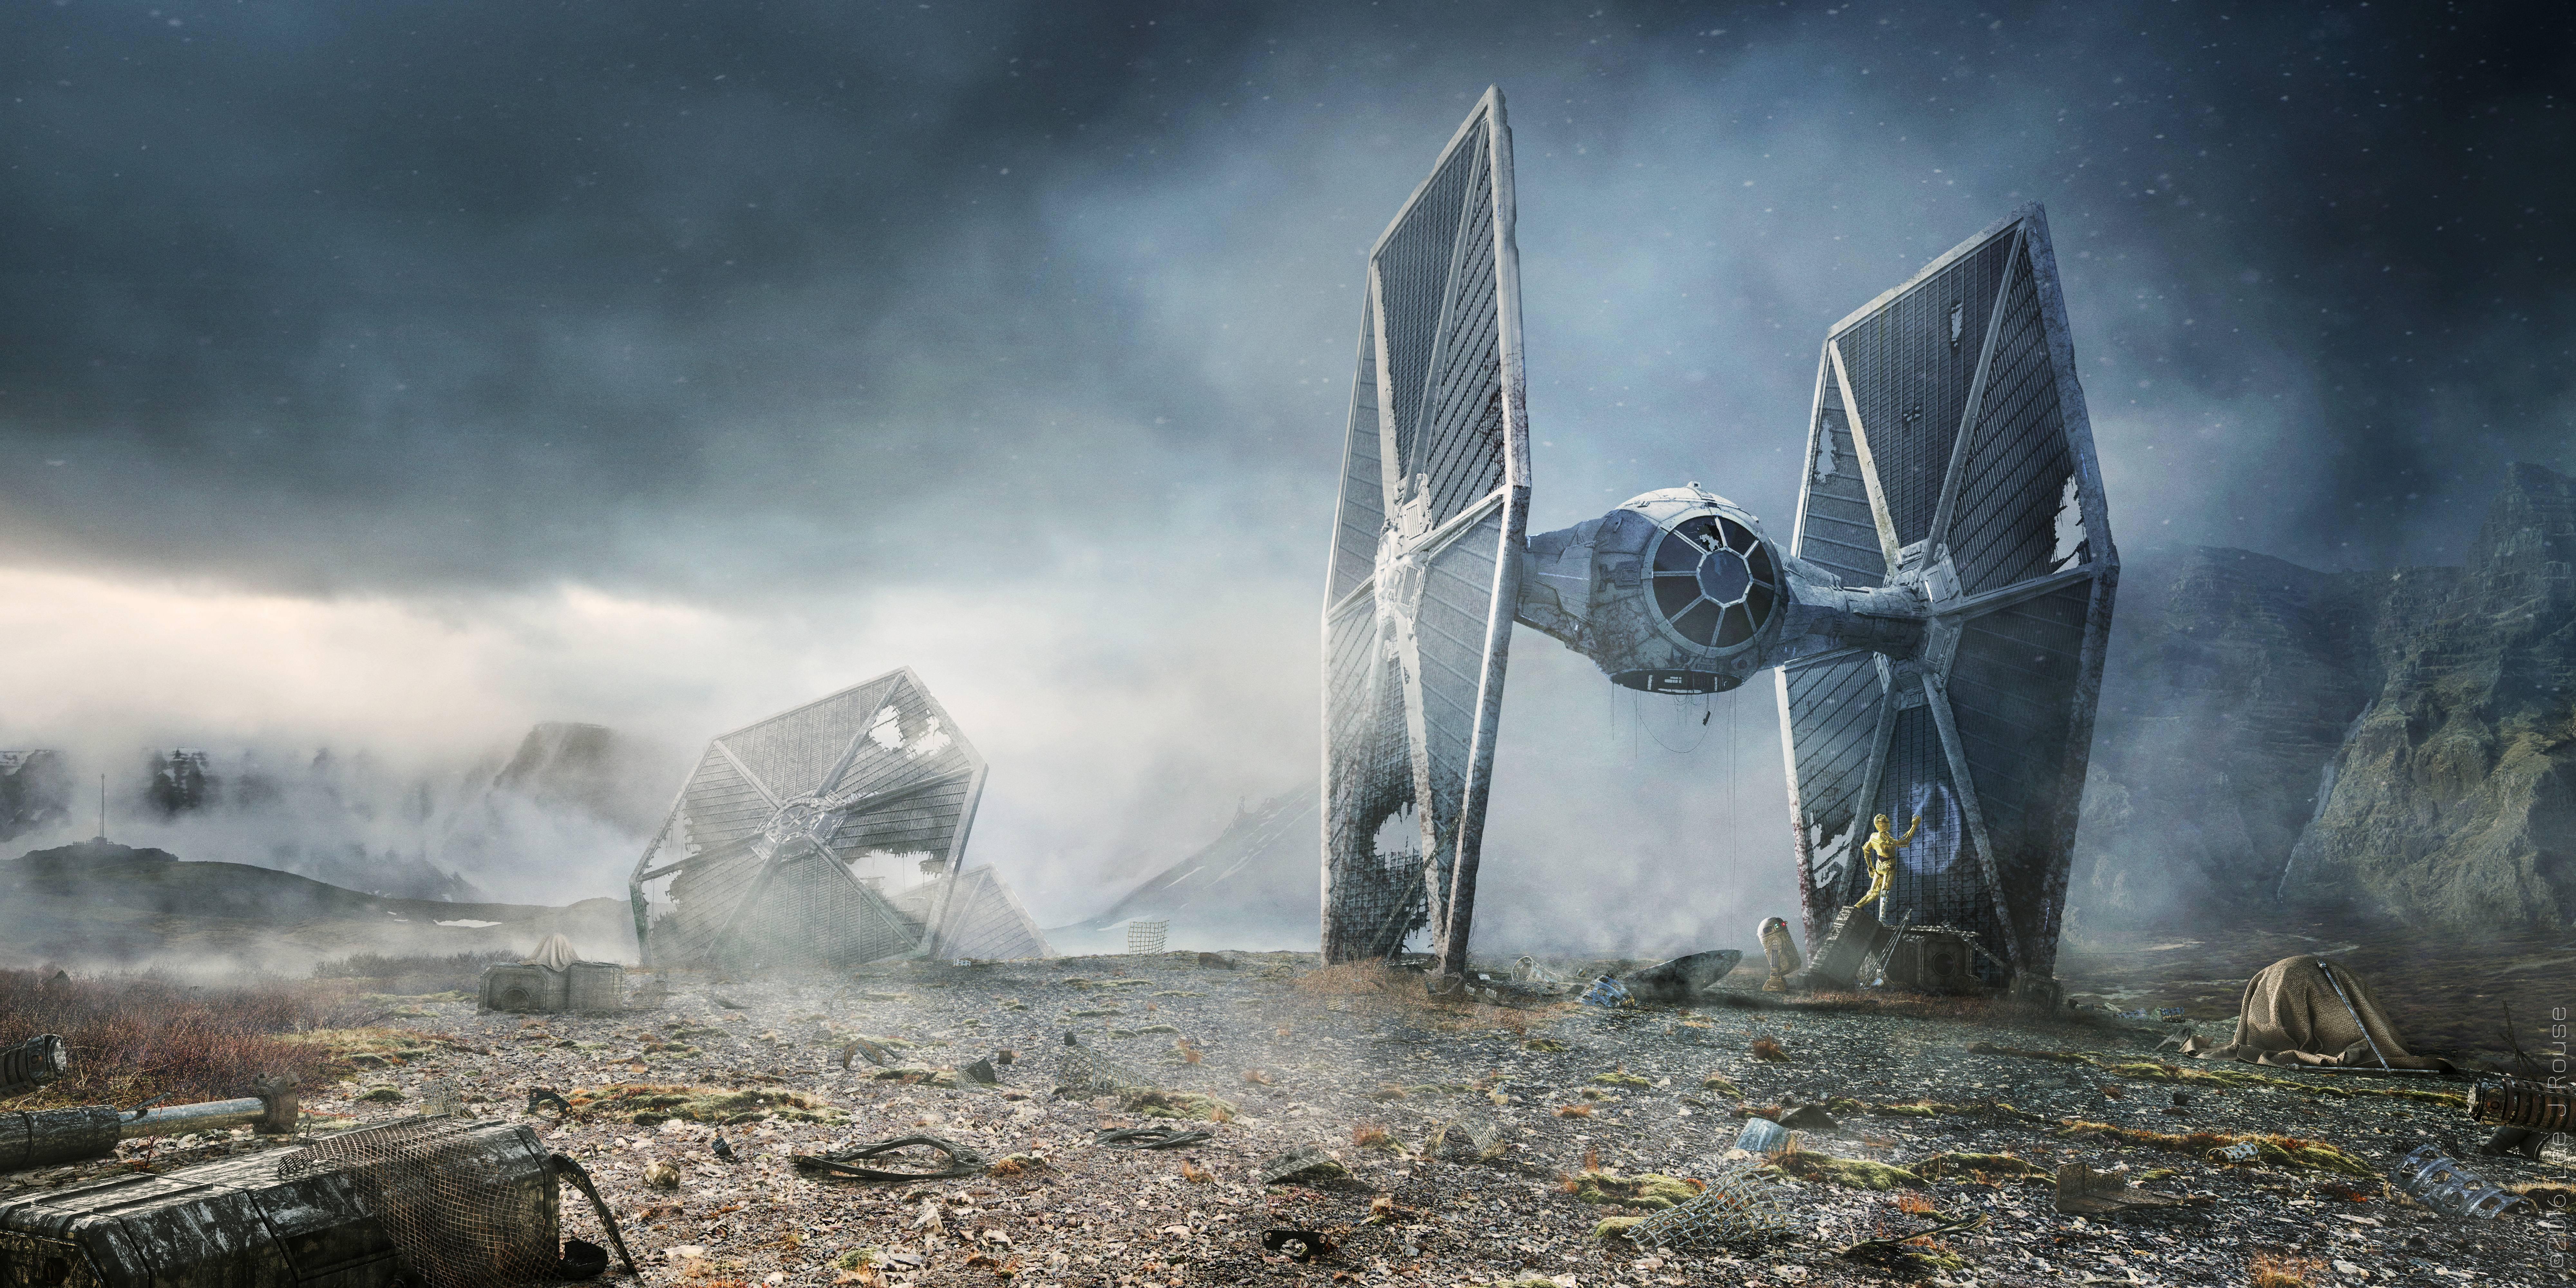 General 8000x4000 Star Wars TIE Fighter C-3PO R2-D2 Star Wars Droids science fiction wreck digital art